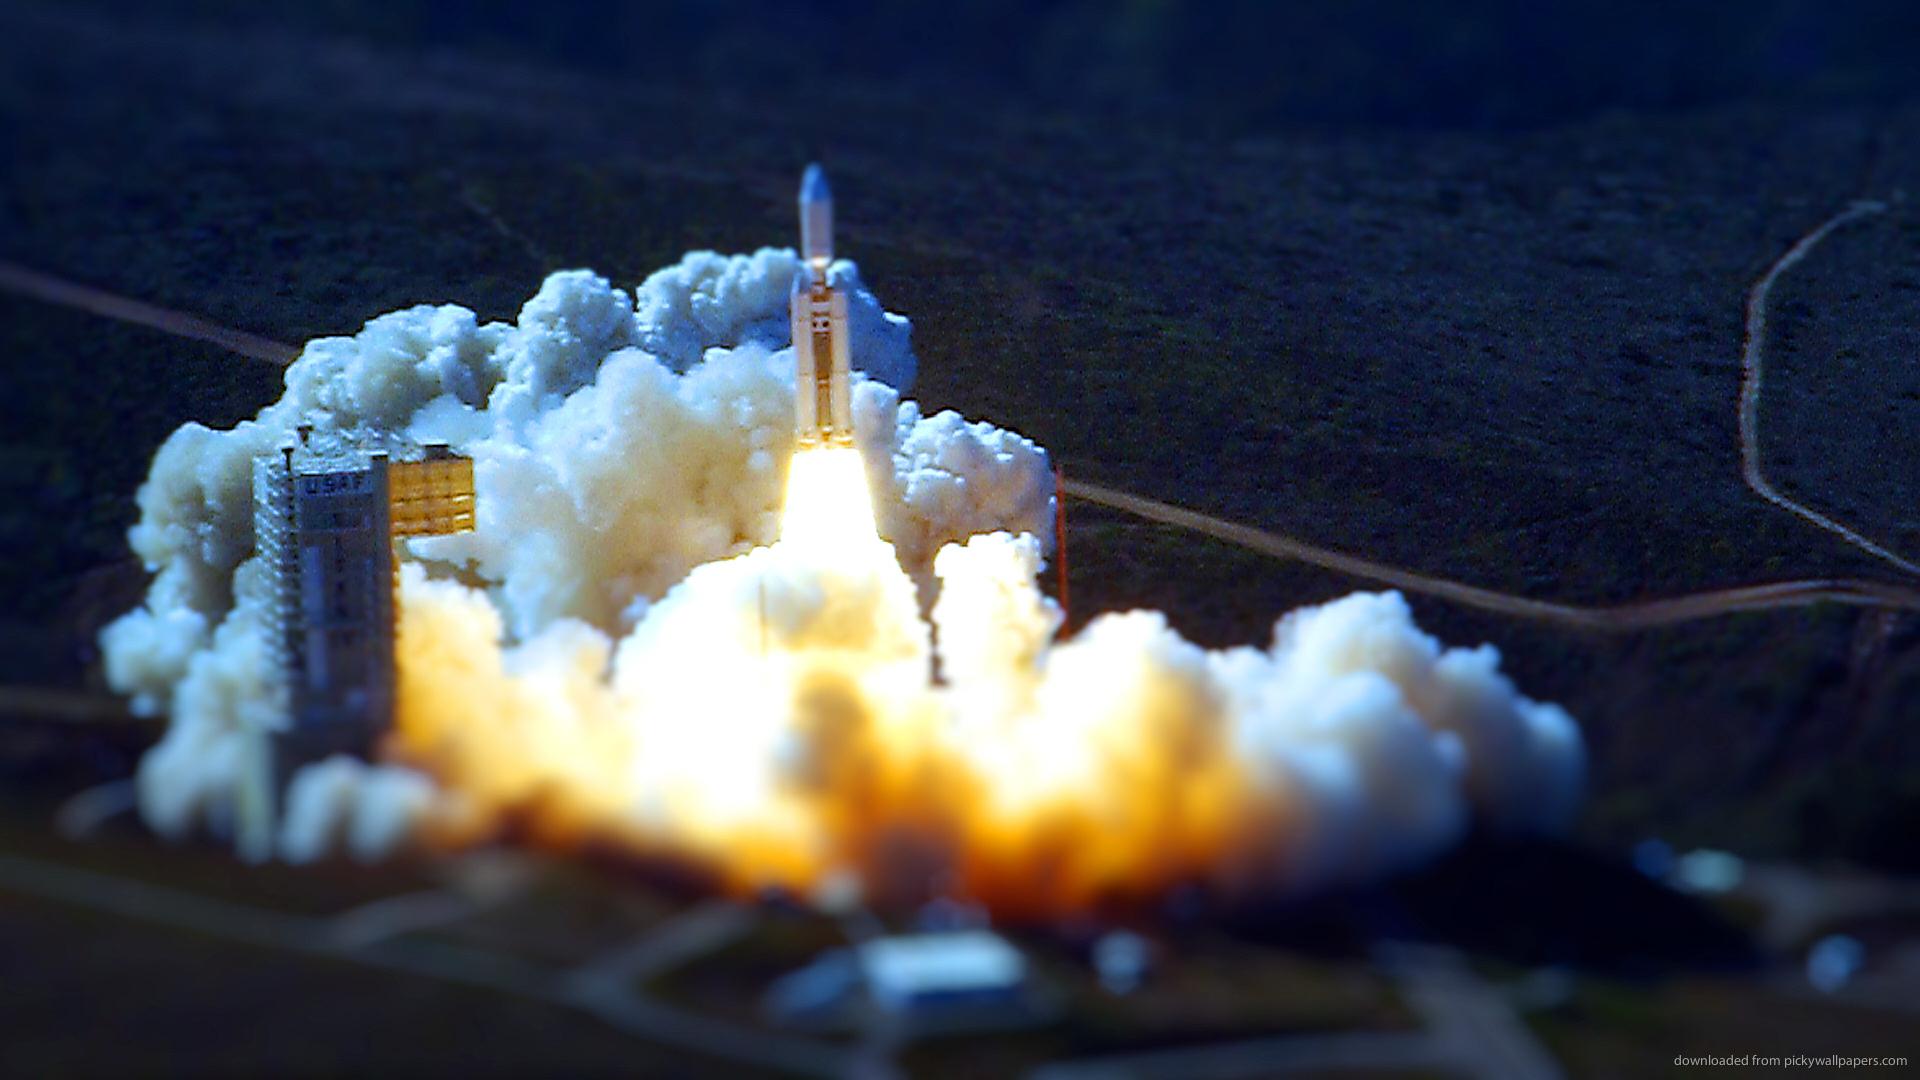 Take off rocket picture 1920x1080